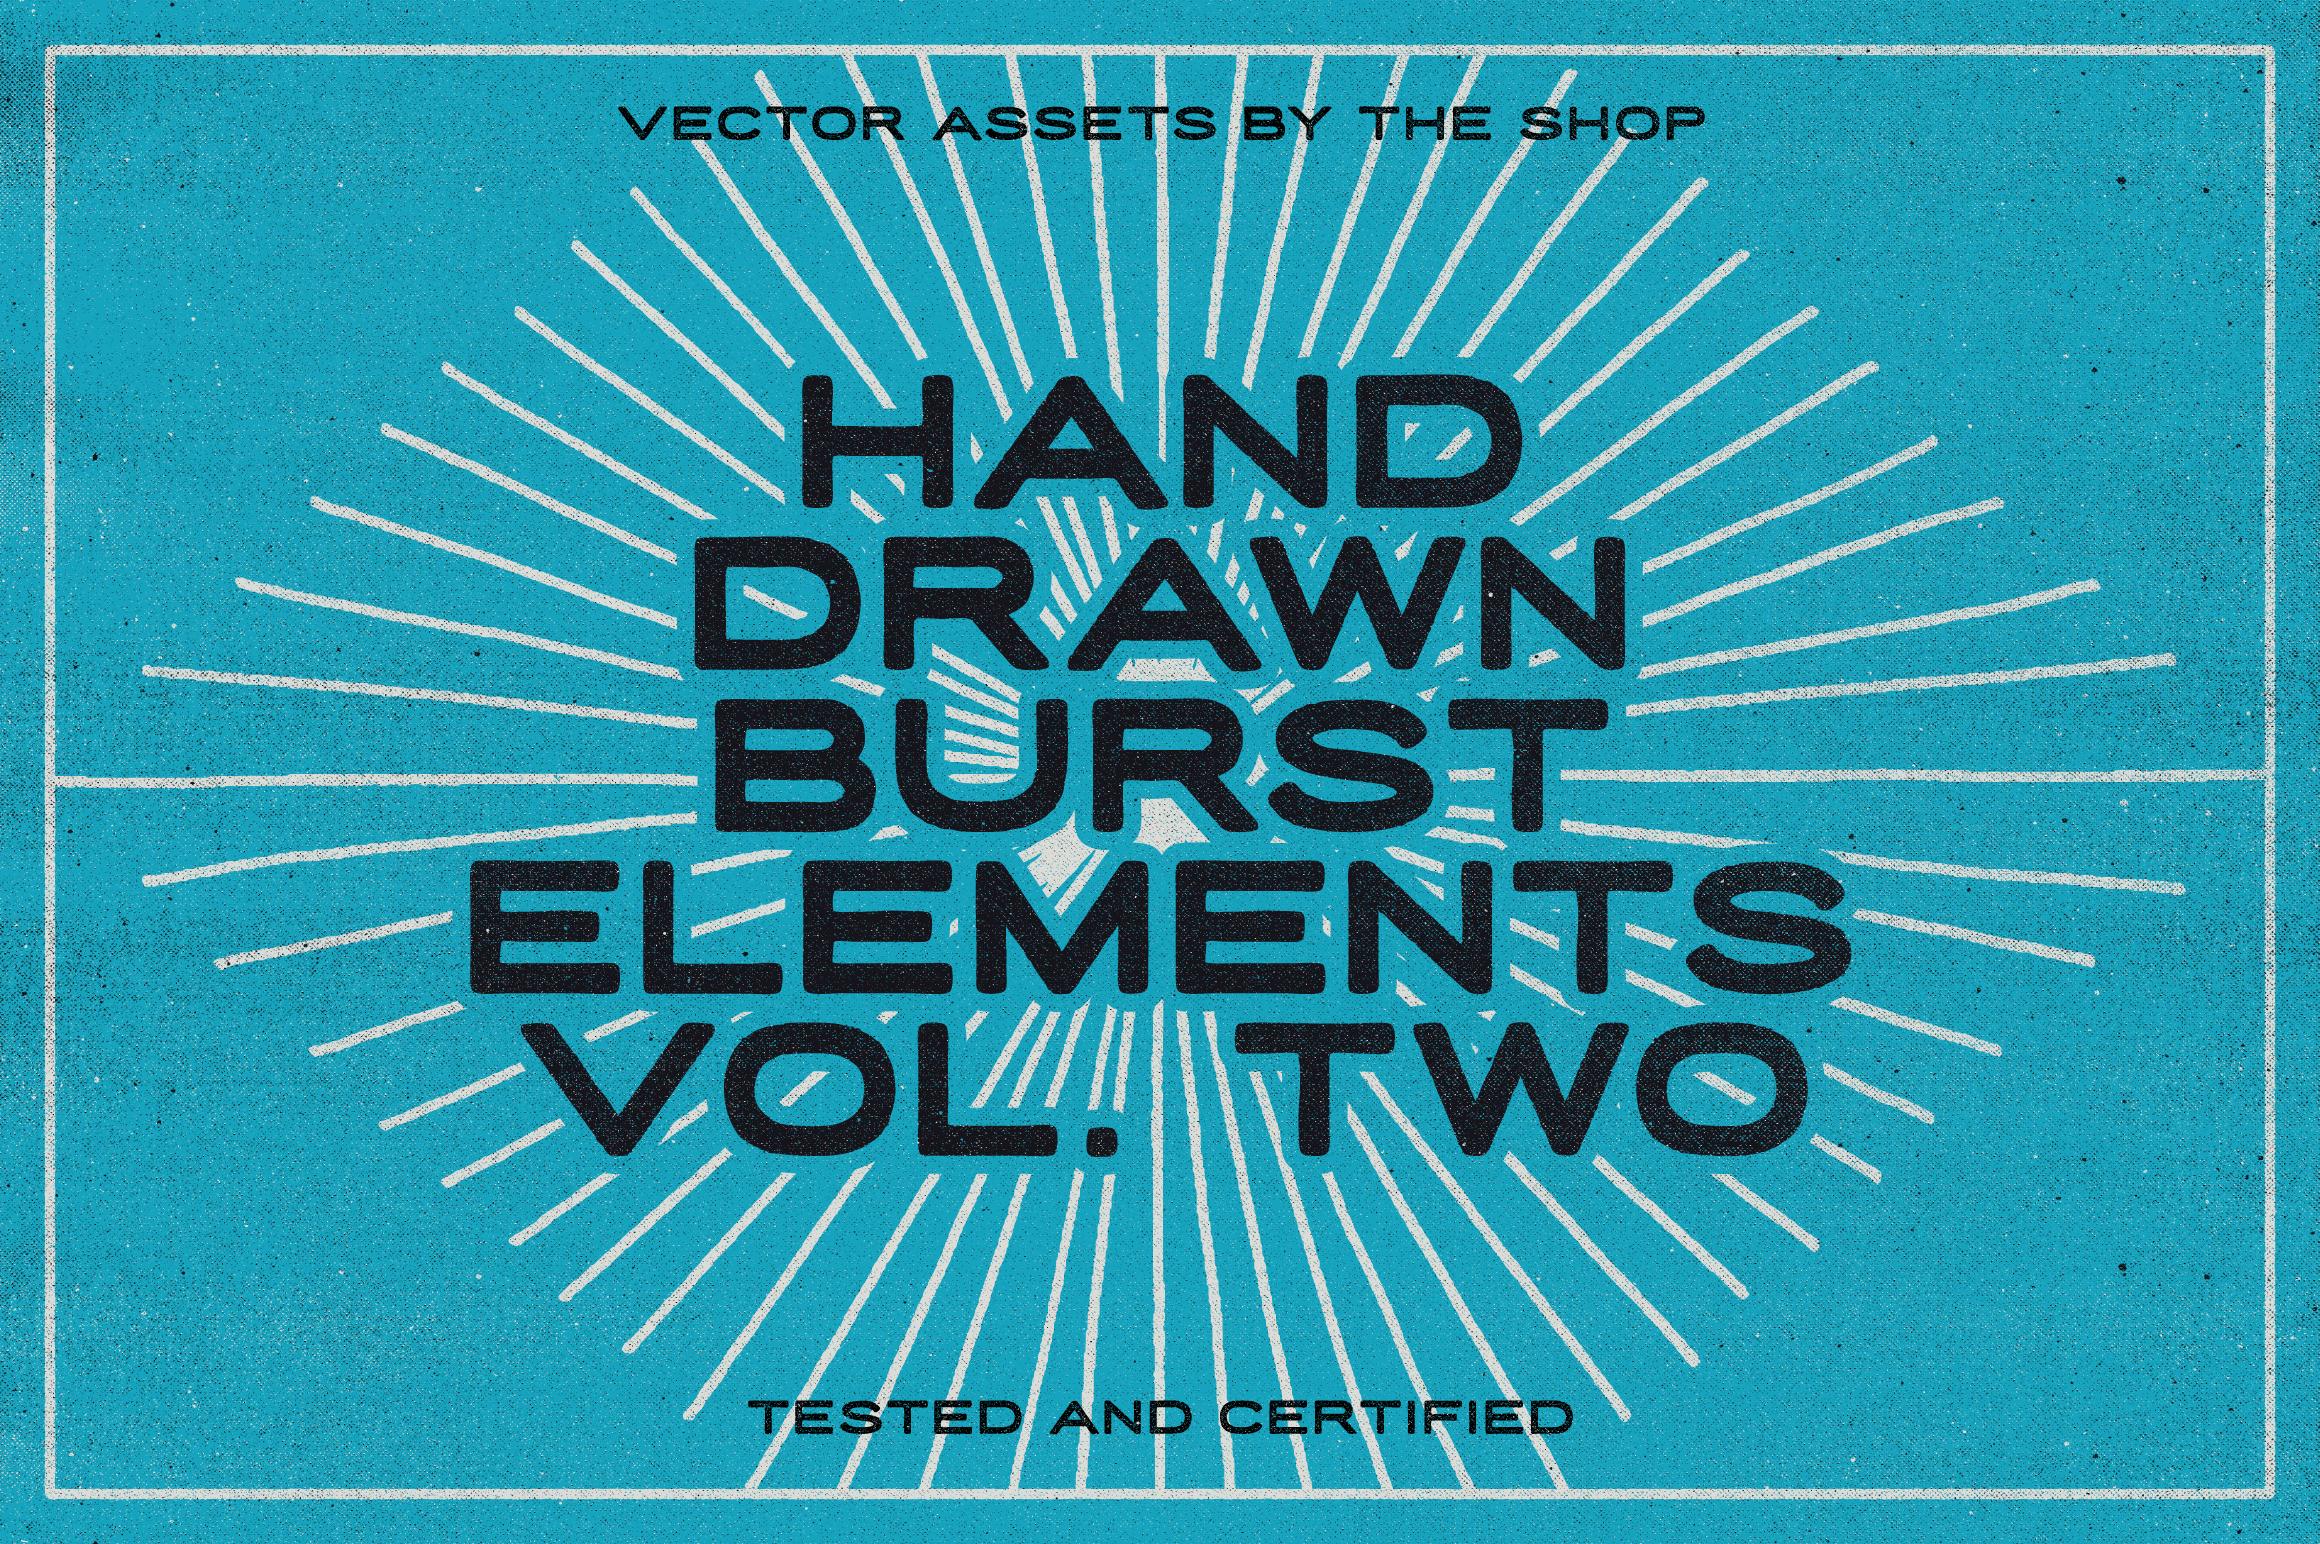 The shop hand drawn burst elements volume 02 hero shot rev 01